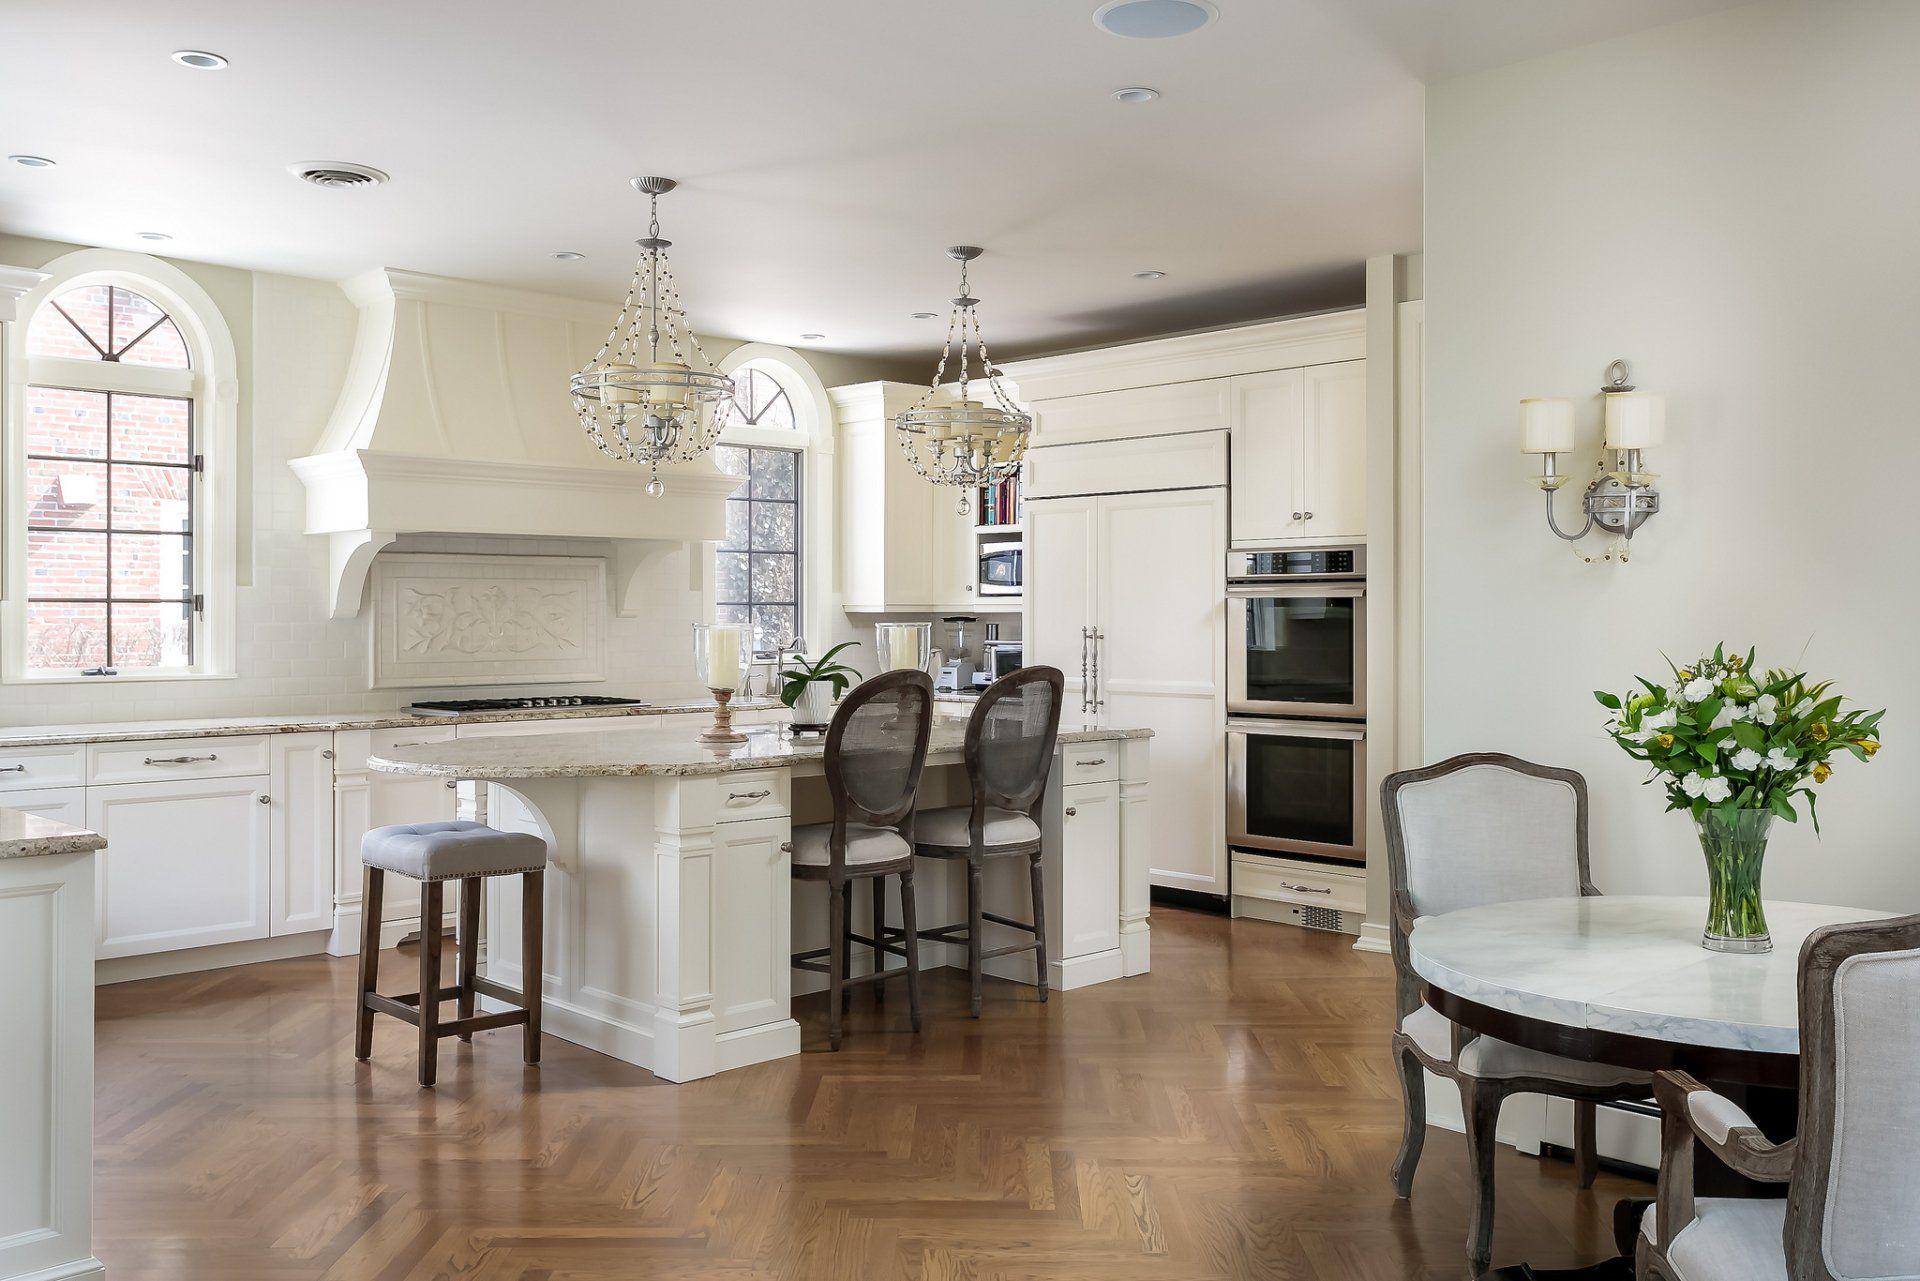 Man Made Room Furniture Kitchen Wallpaper